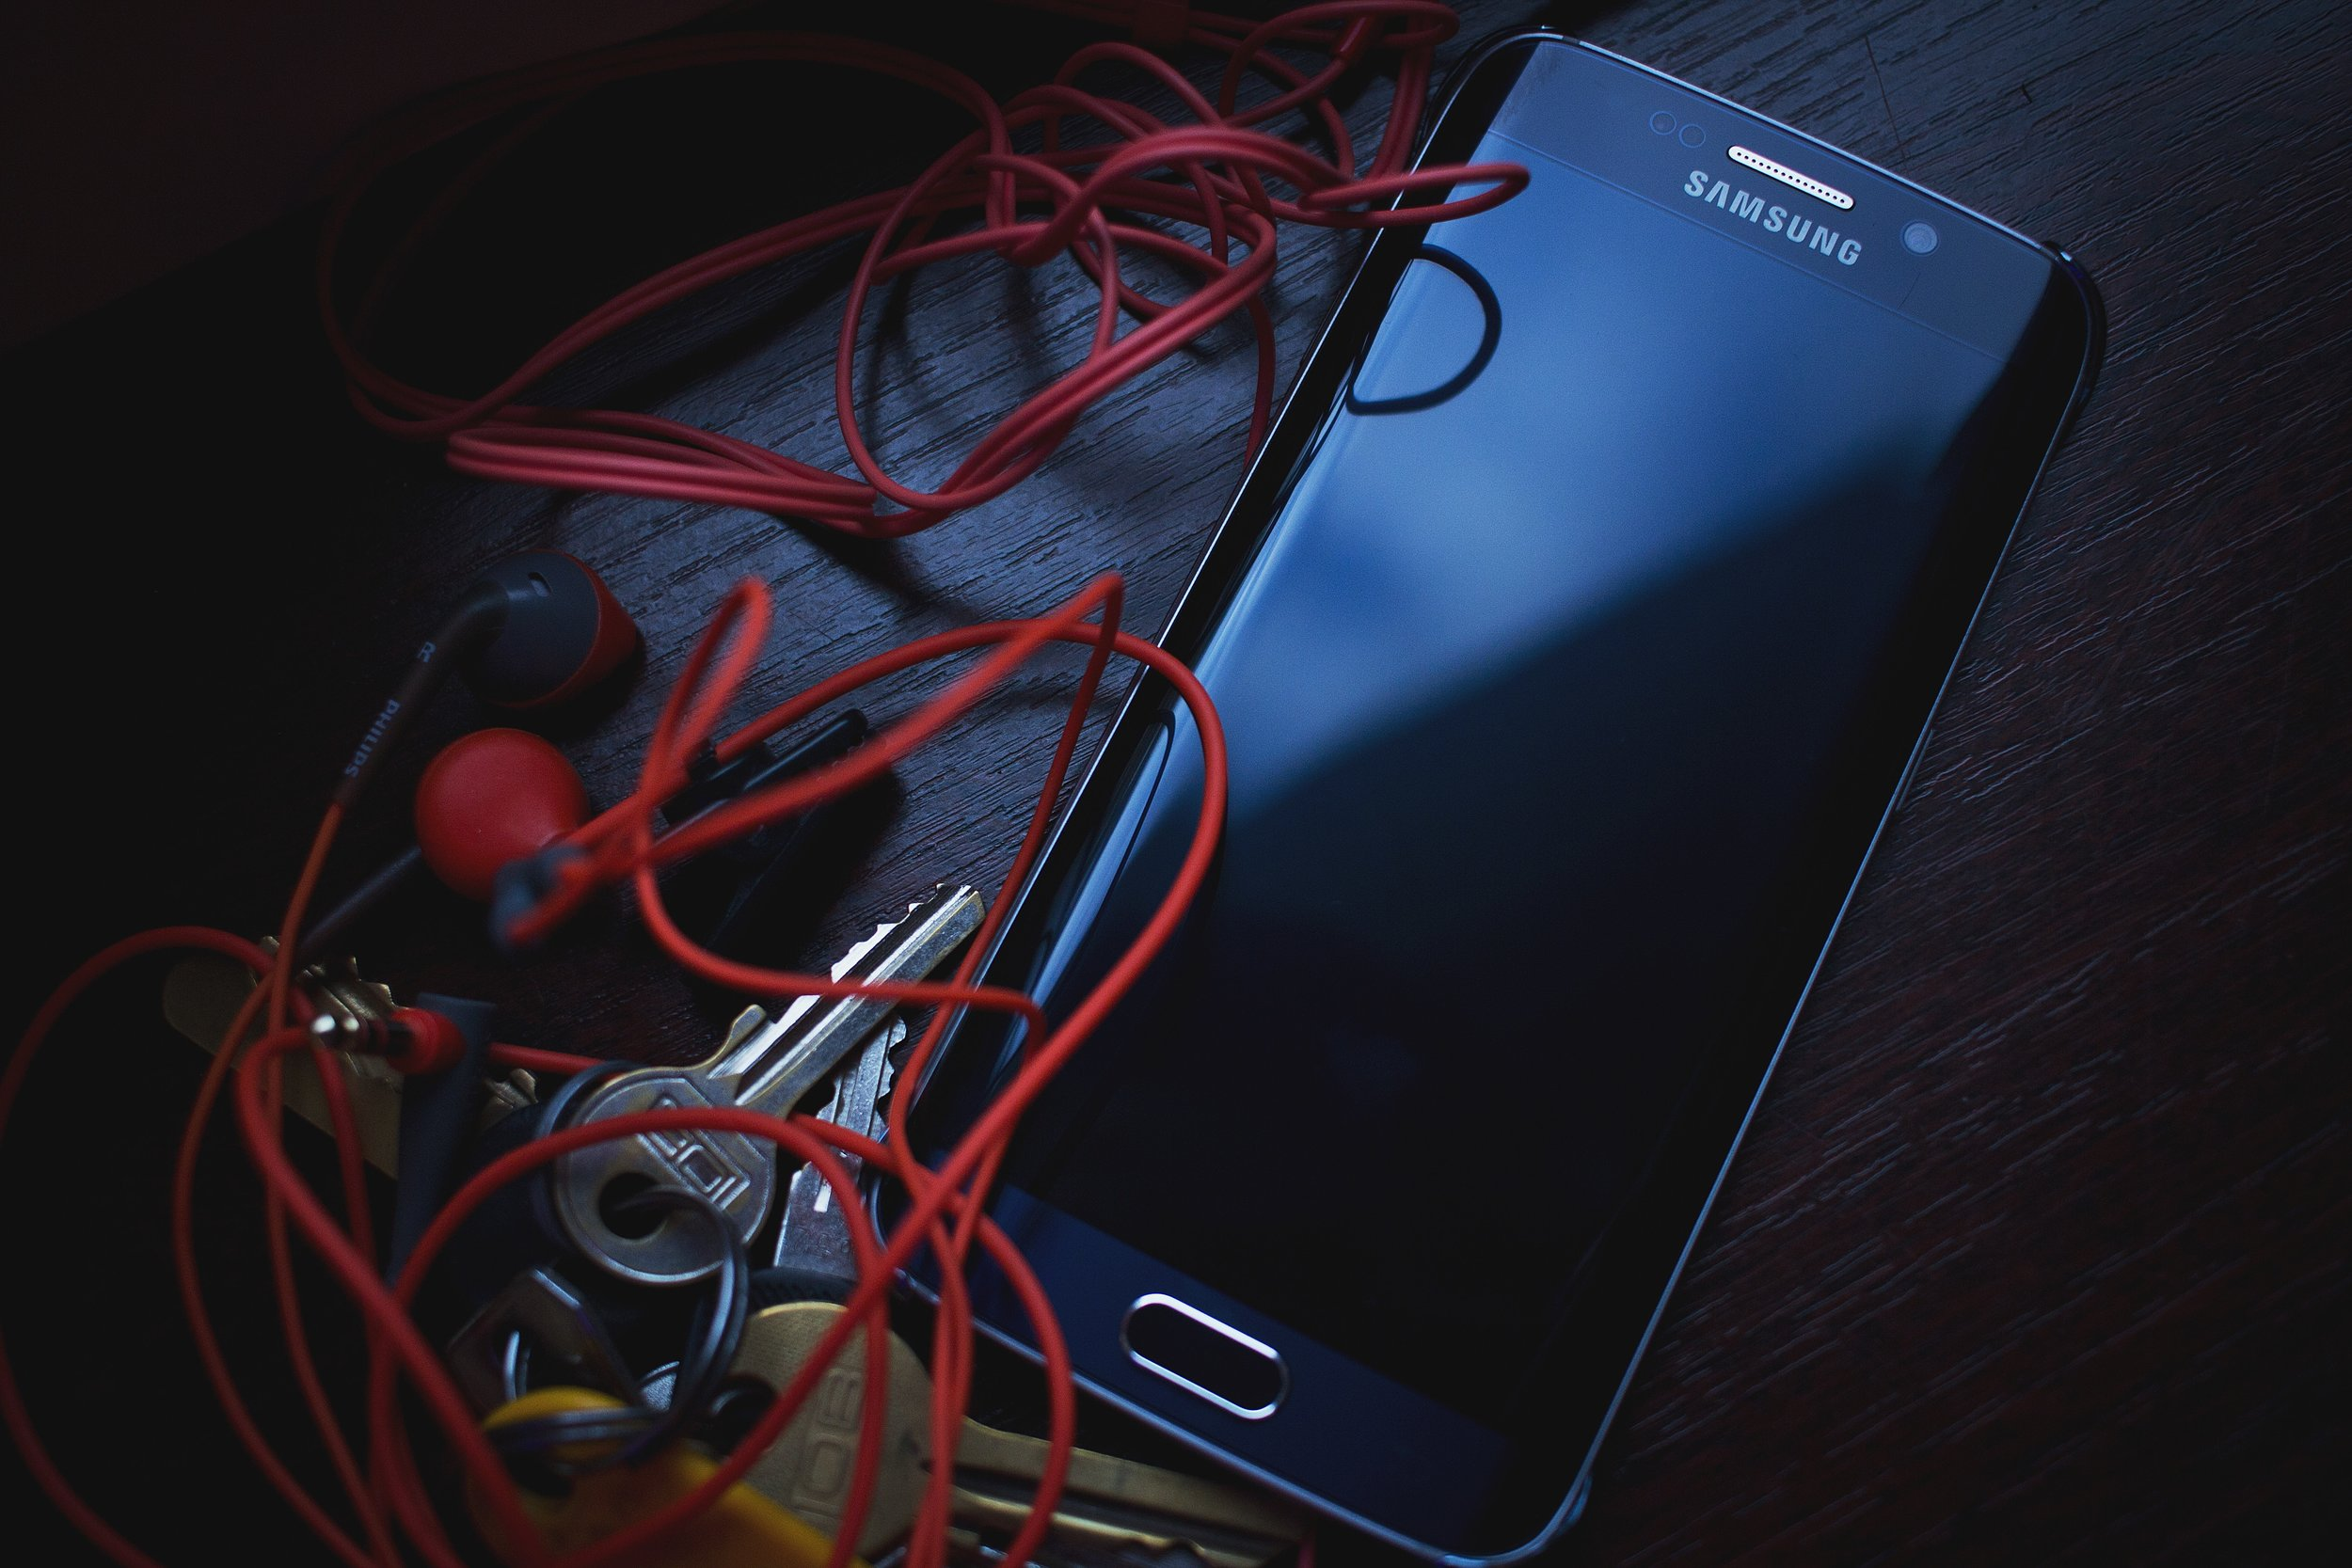 cellphone-dark-earbuds-159239.jpg